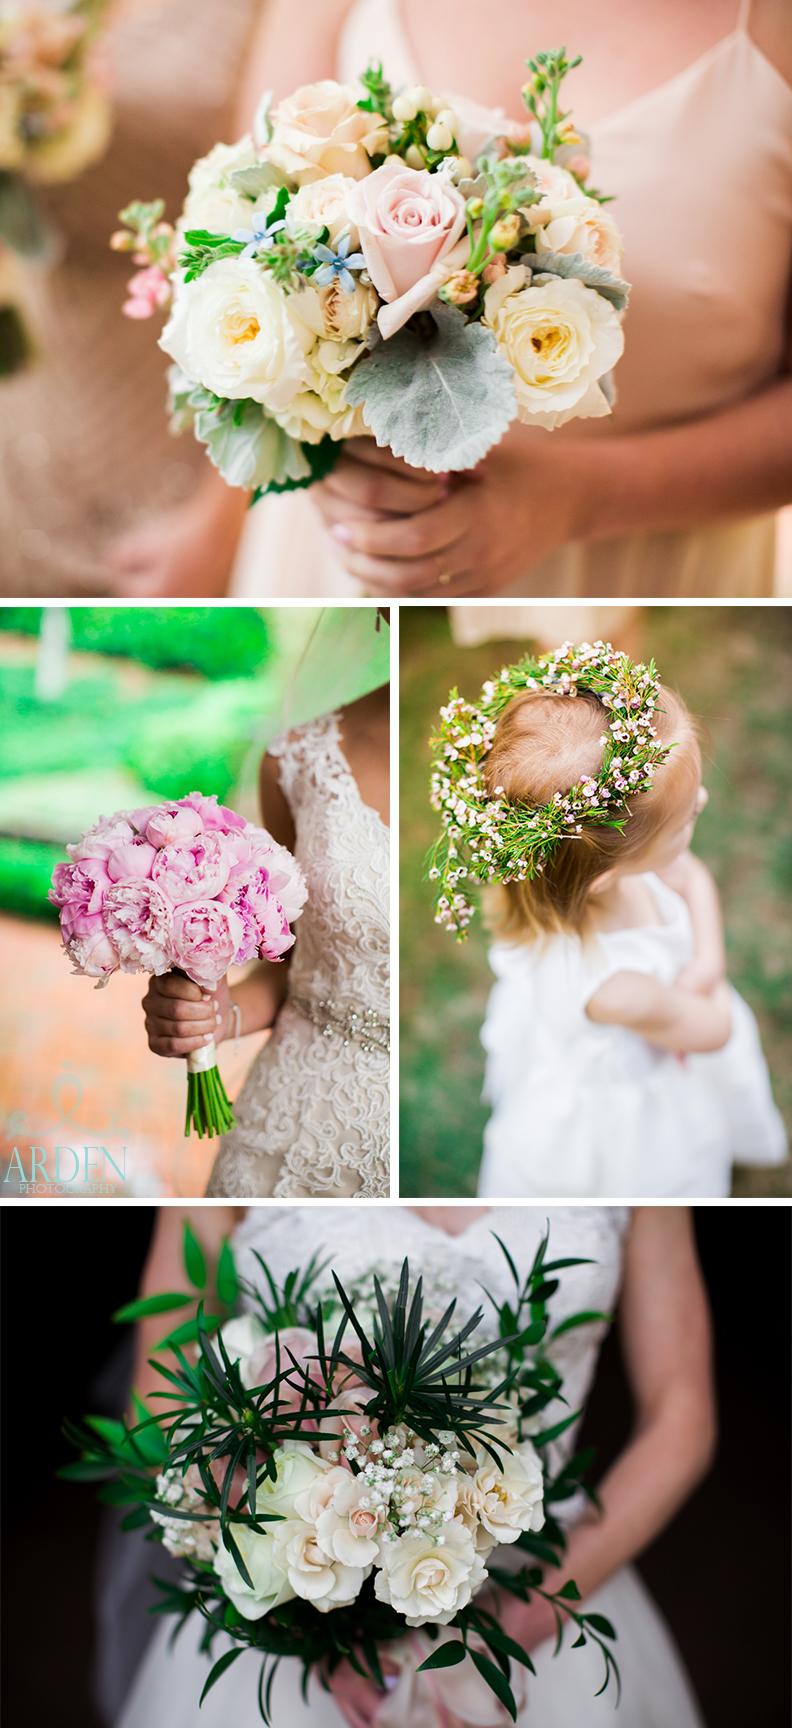 Spring_Bouquet_2018_Arden_Photography-3.jpg